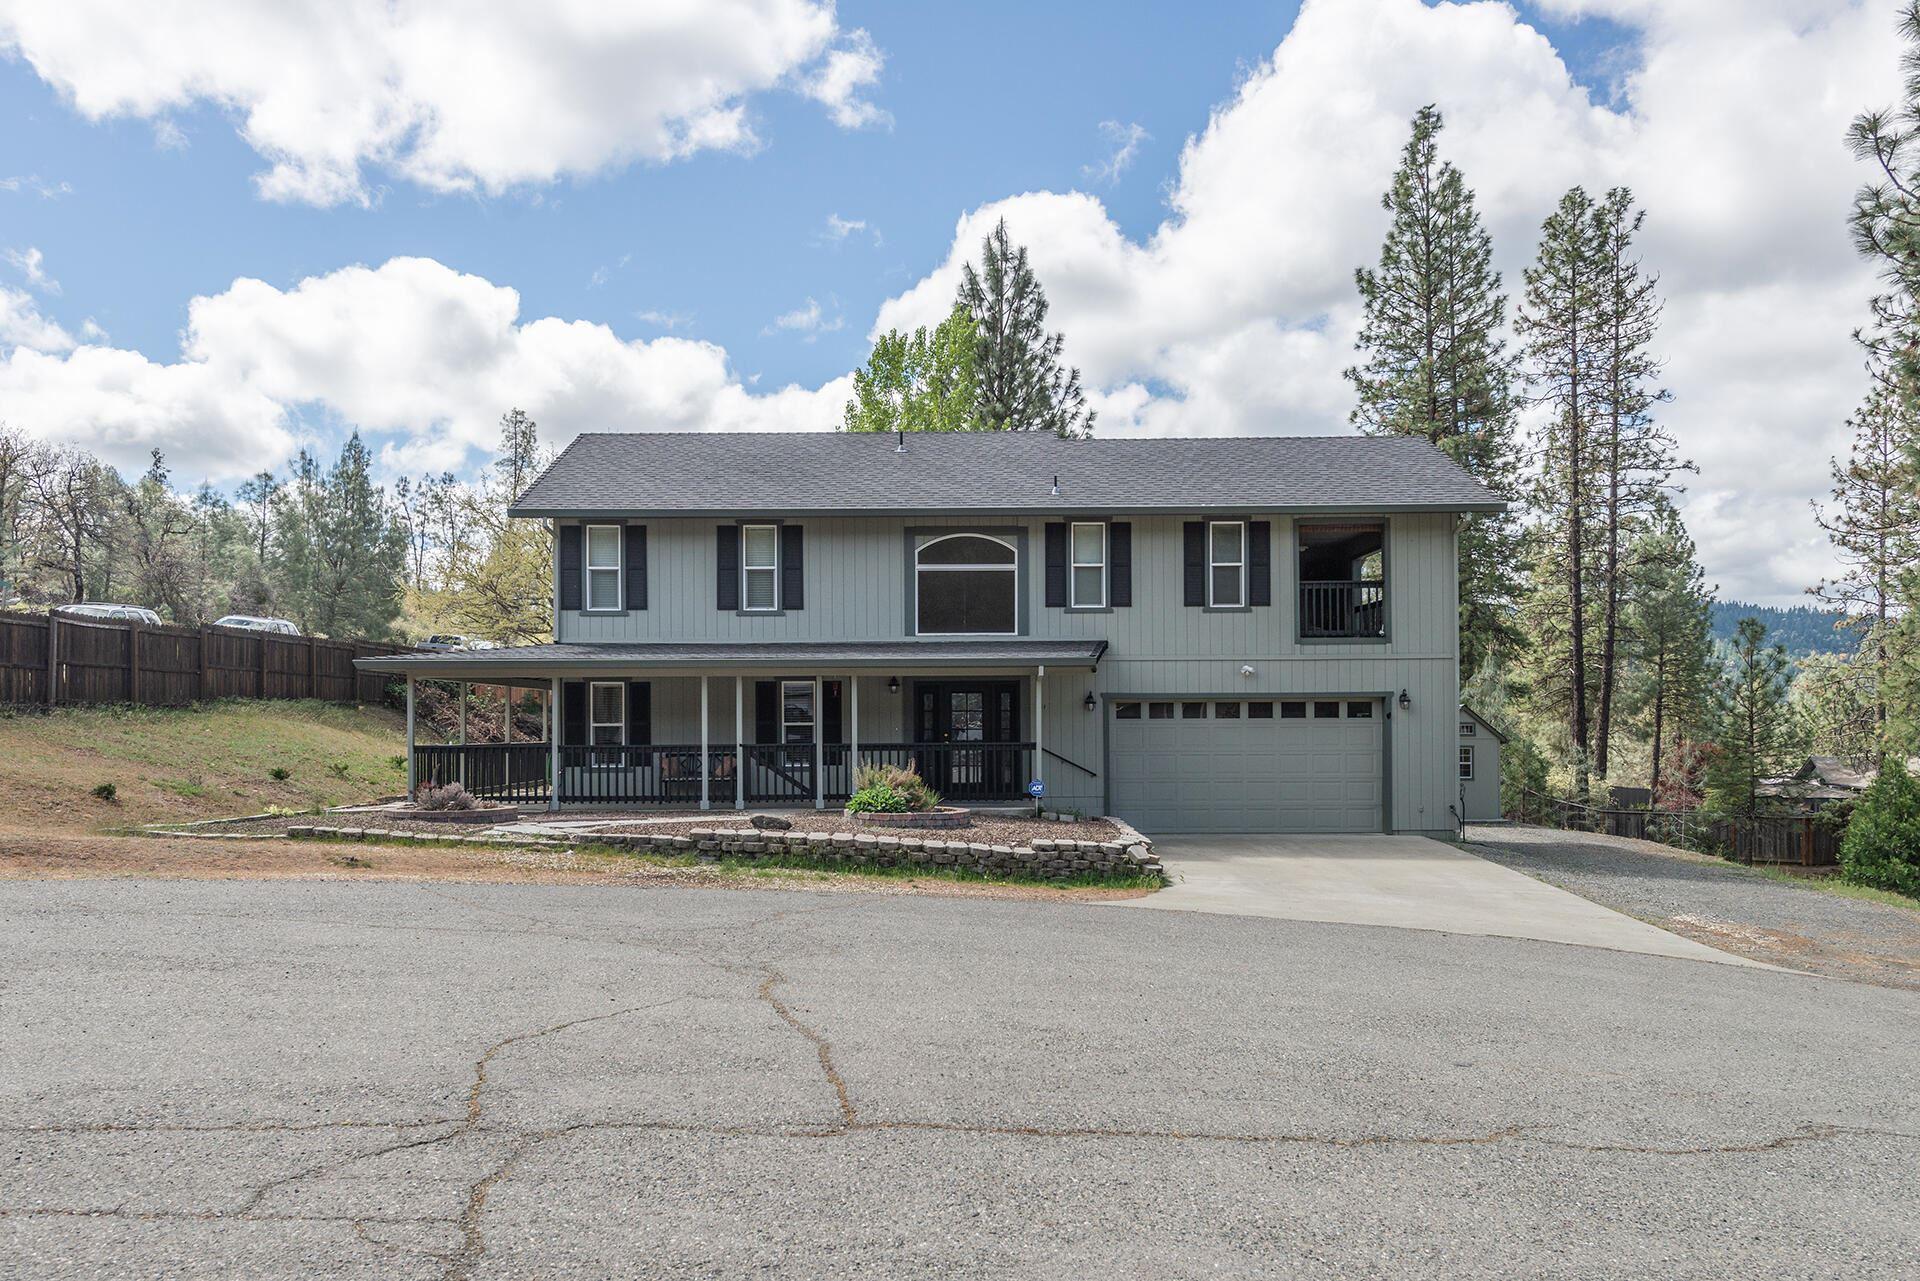 51 Beryl Lane, Weaverville, CA 96093 - MLS#: 258980